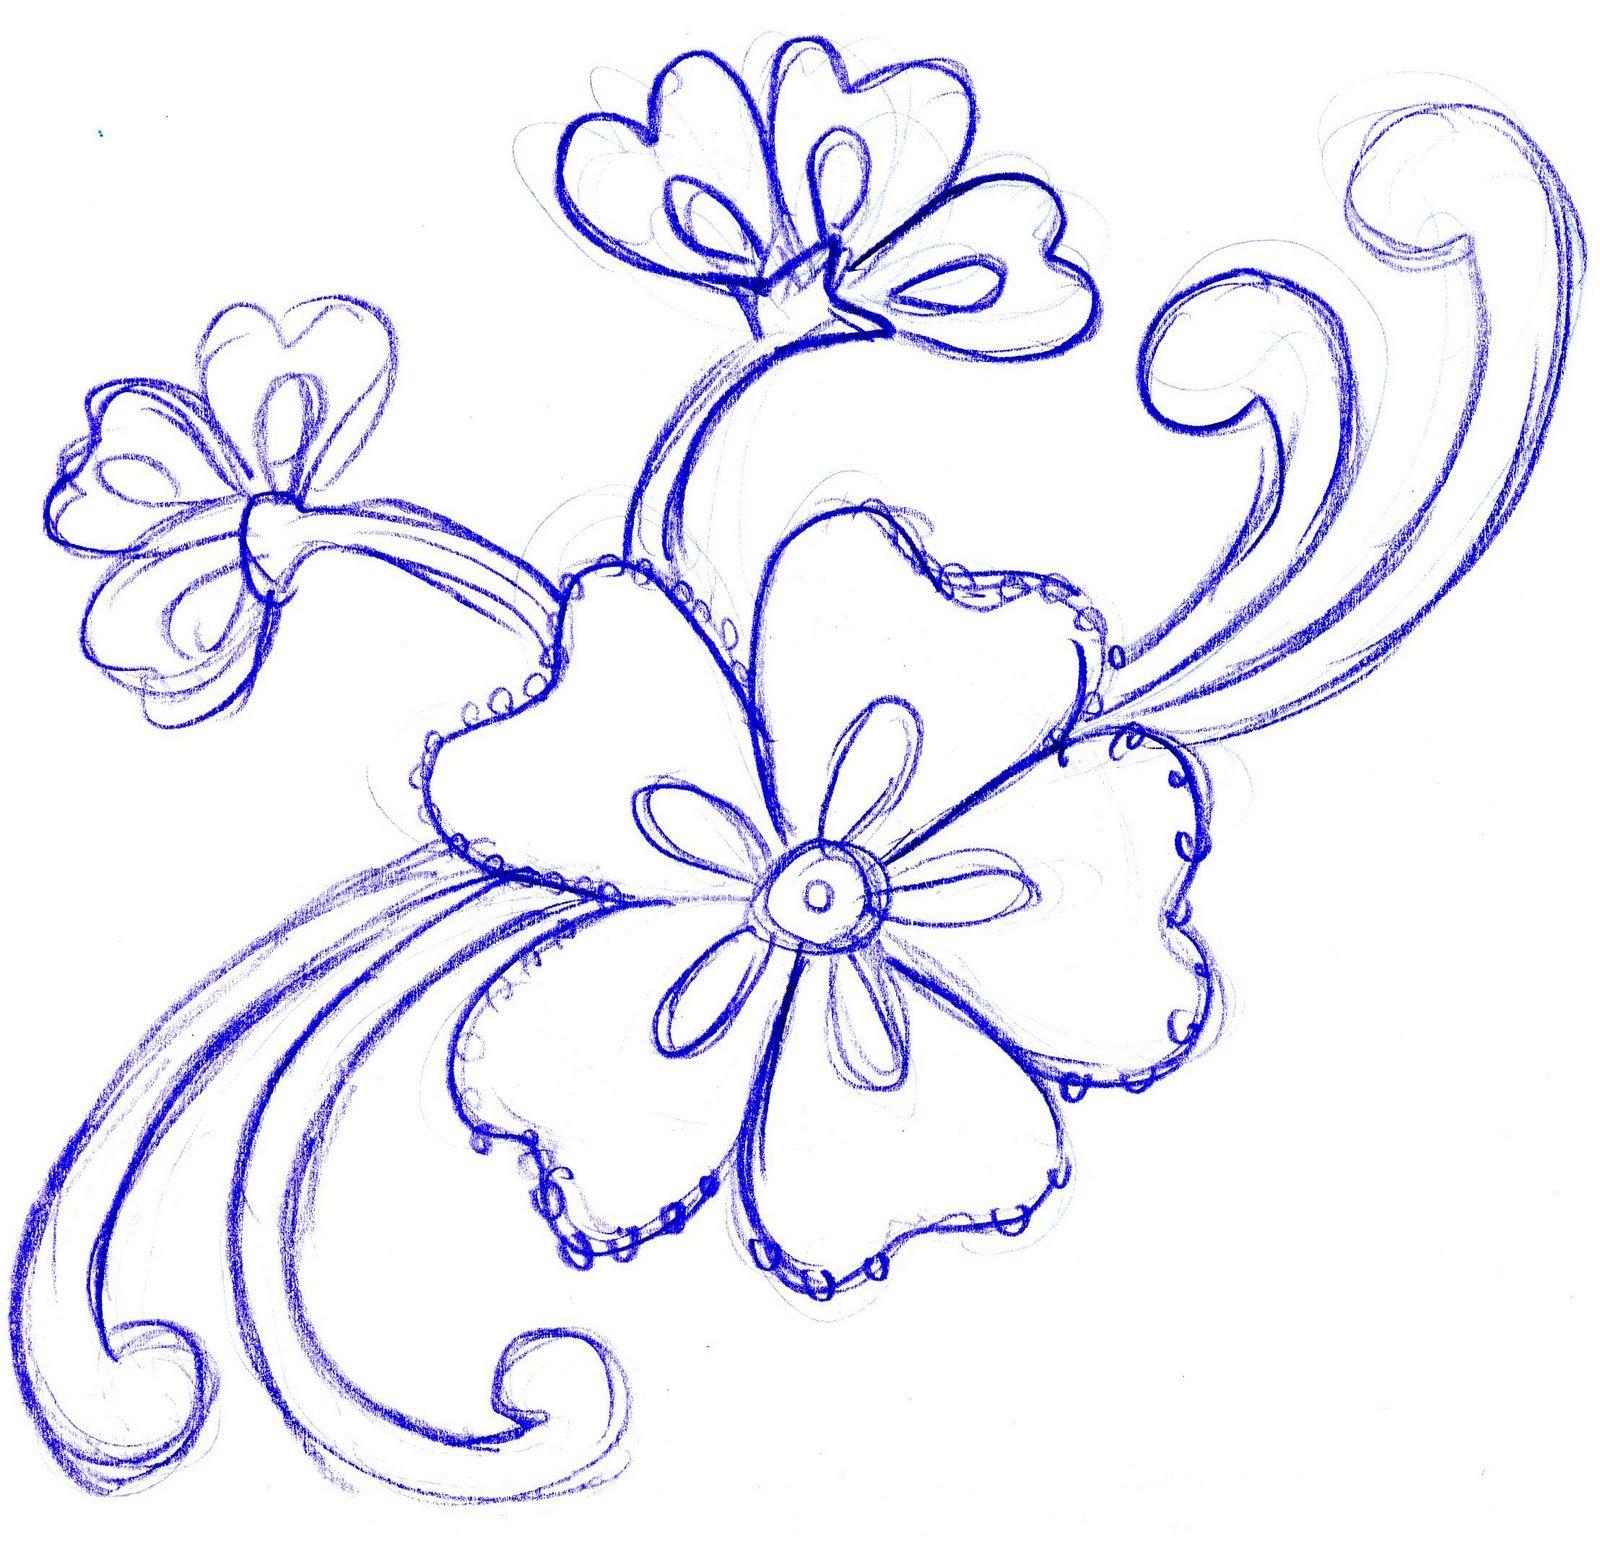 1600x1542 Sketches Of Flowers Corinne Okada Design Concept Sketches